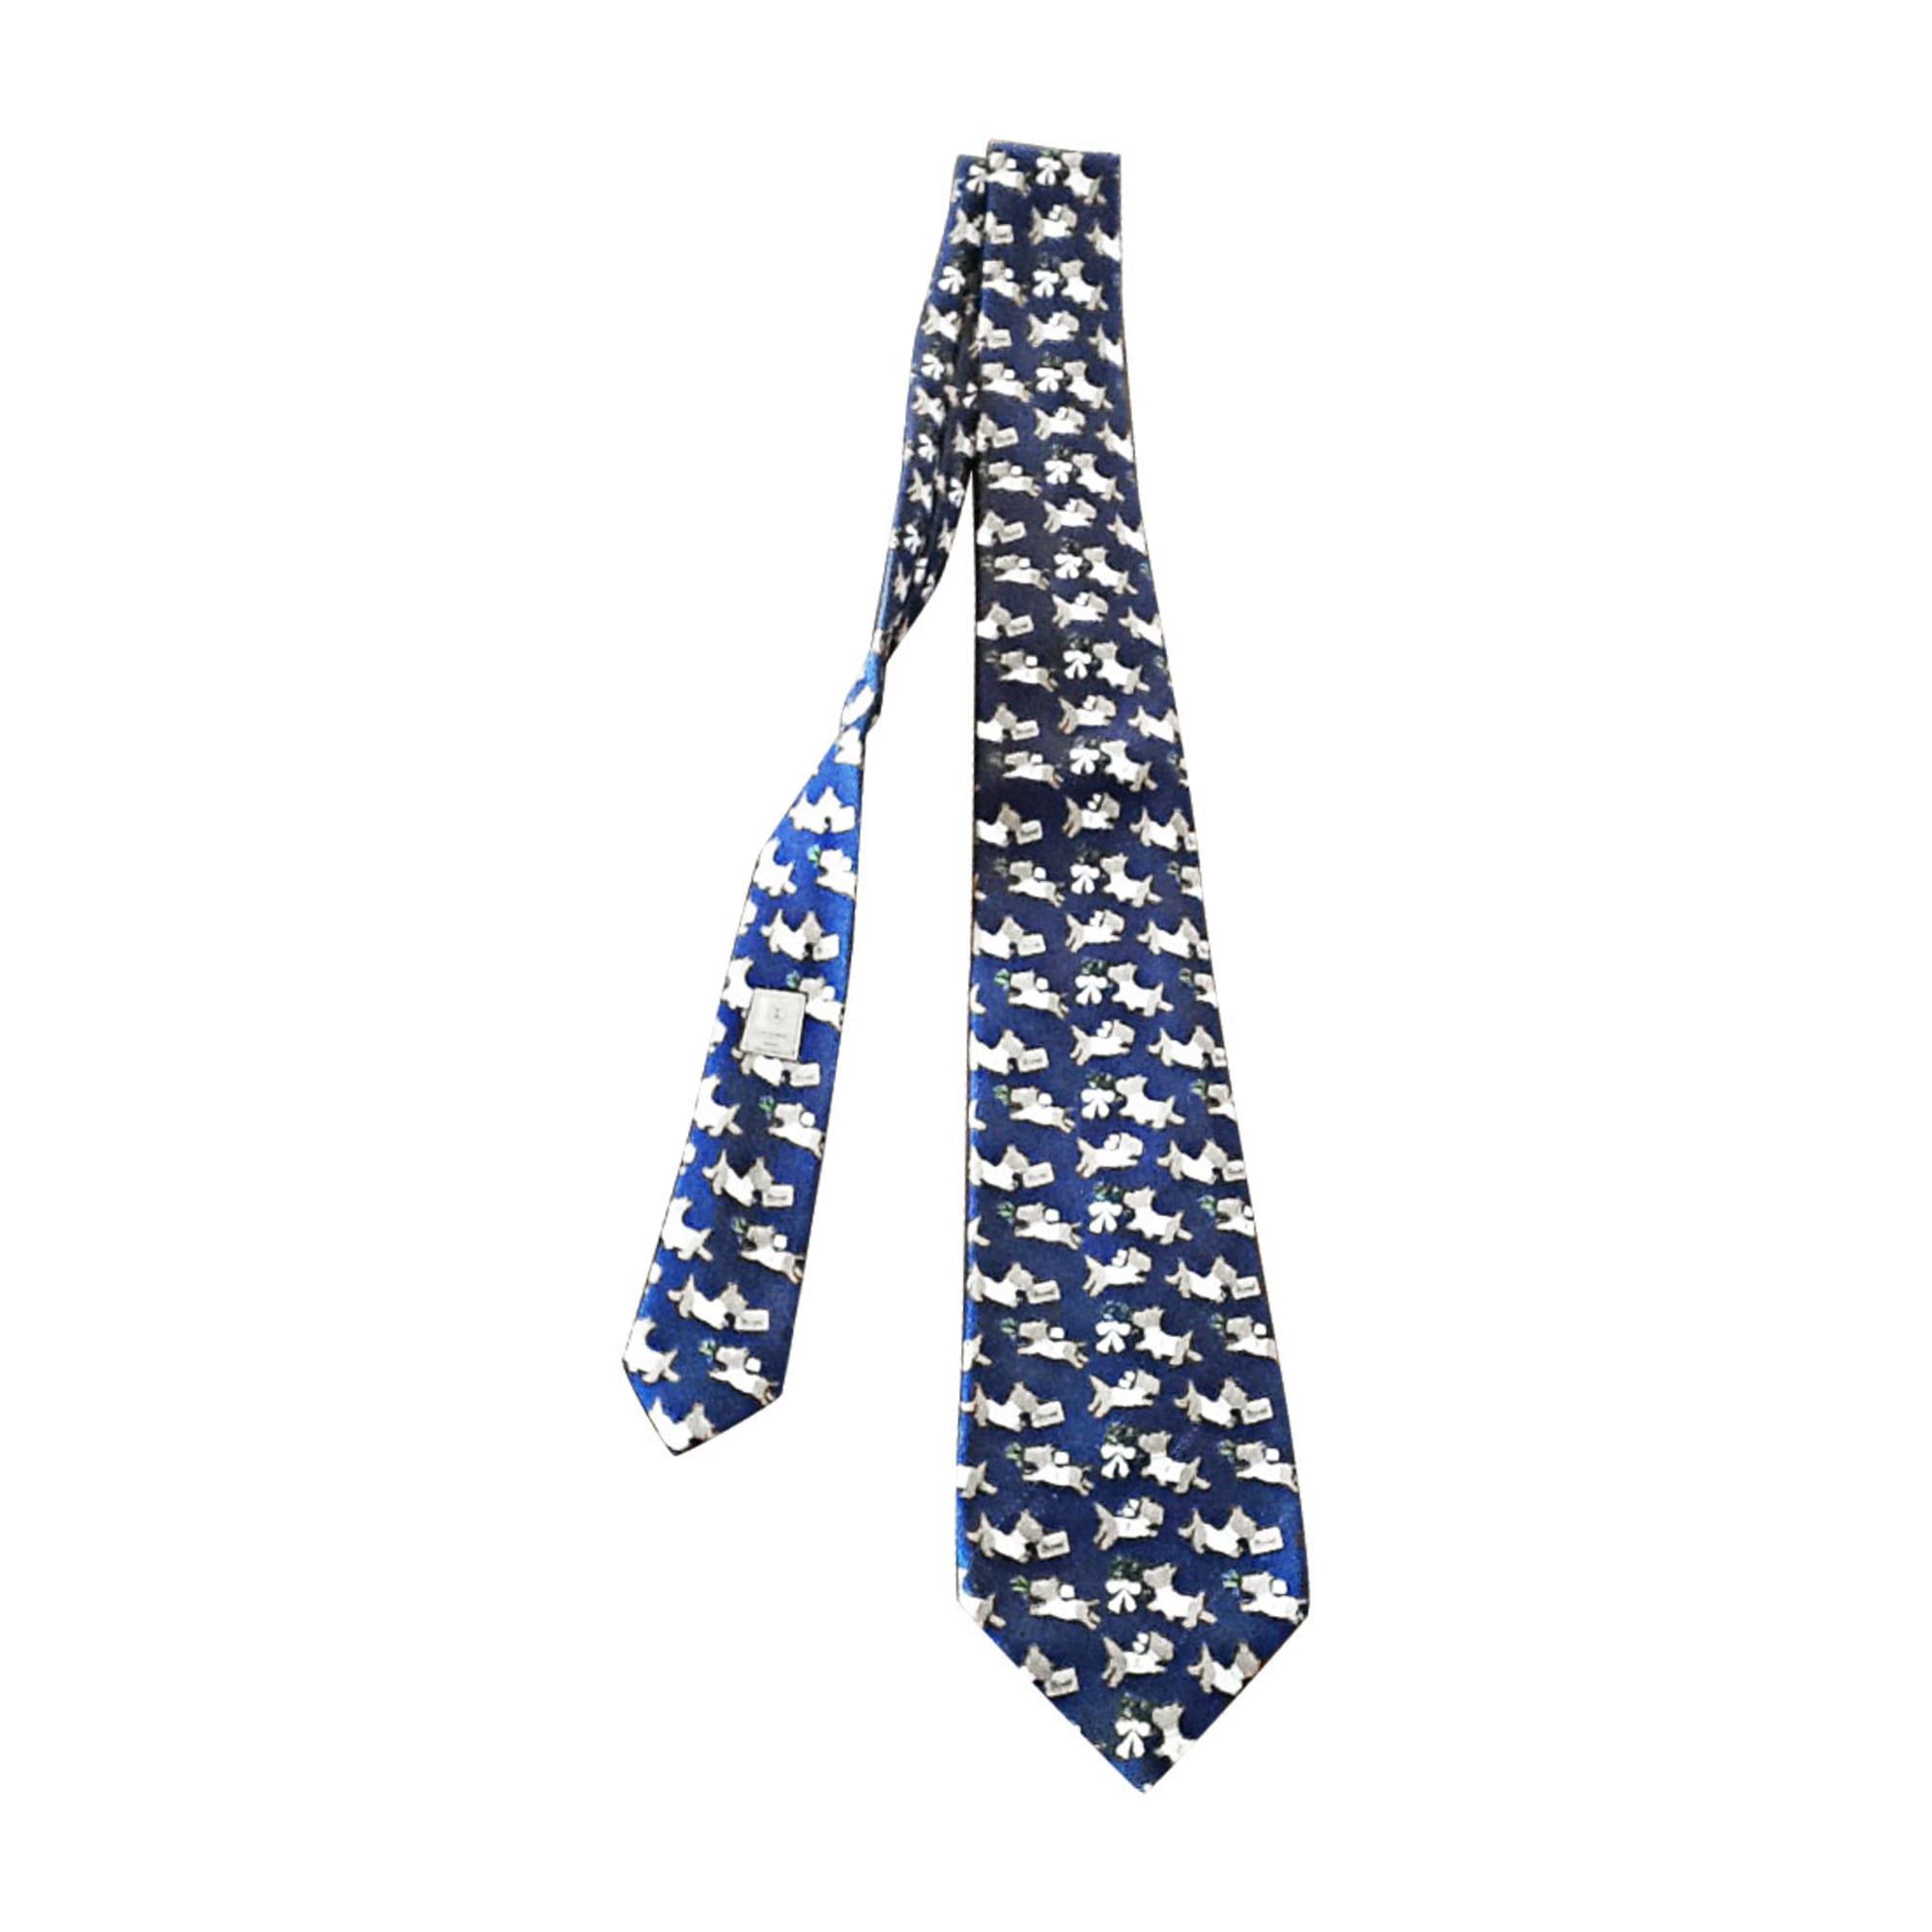 Cravate CHANEL Bleu, bleu marine, bleu turquoise